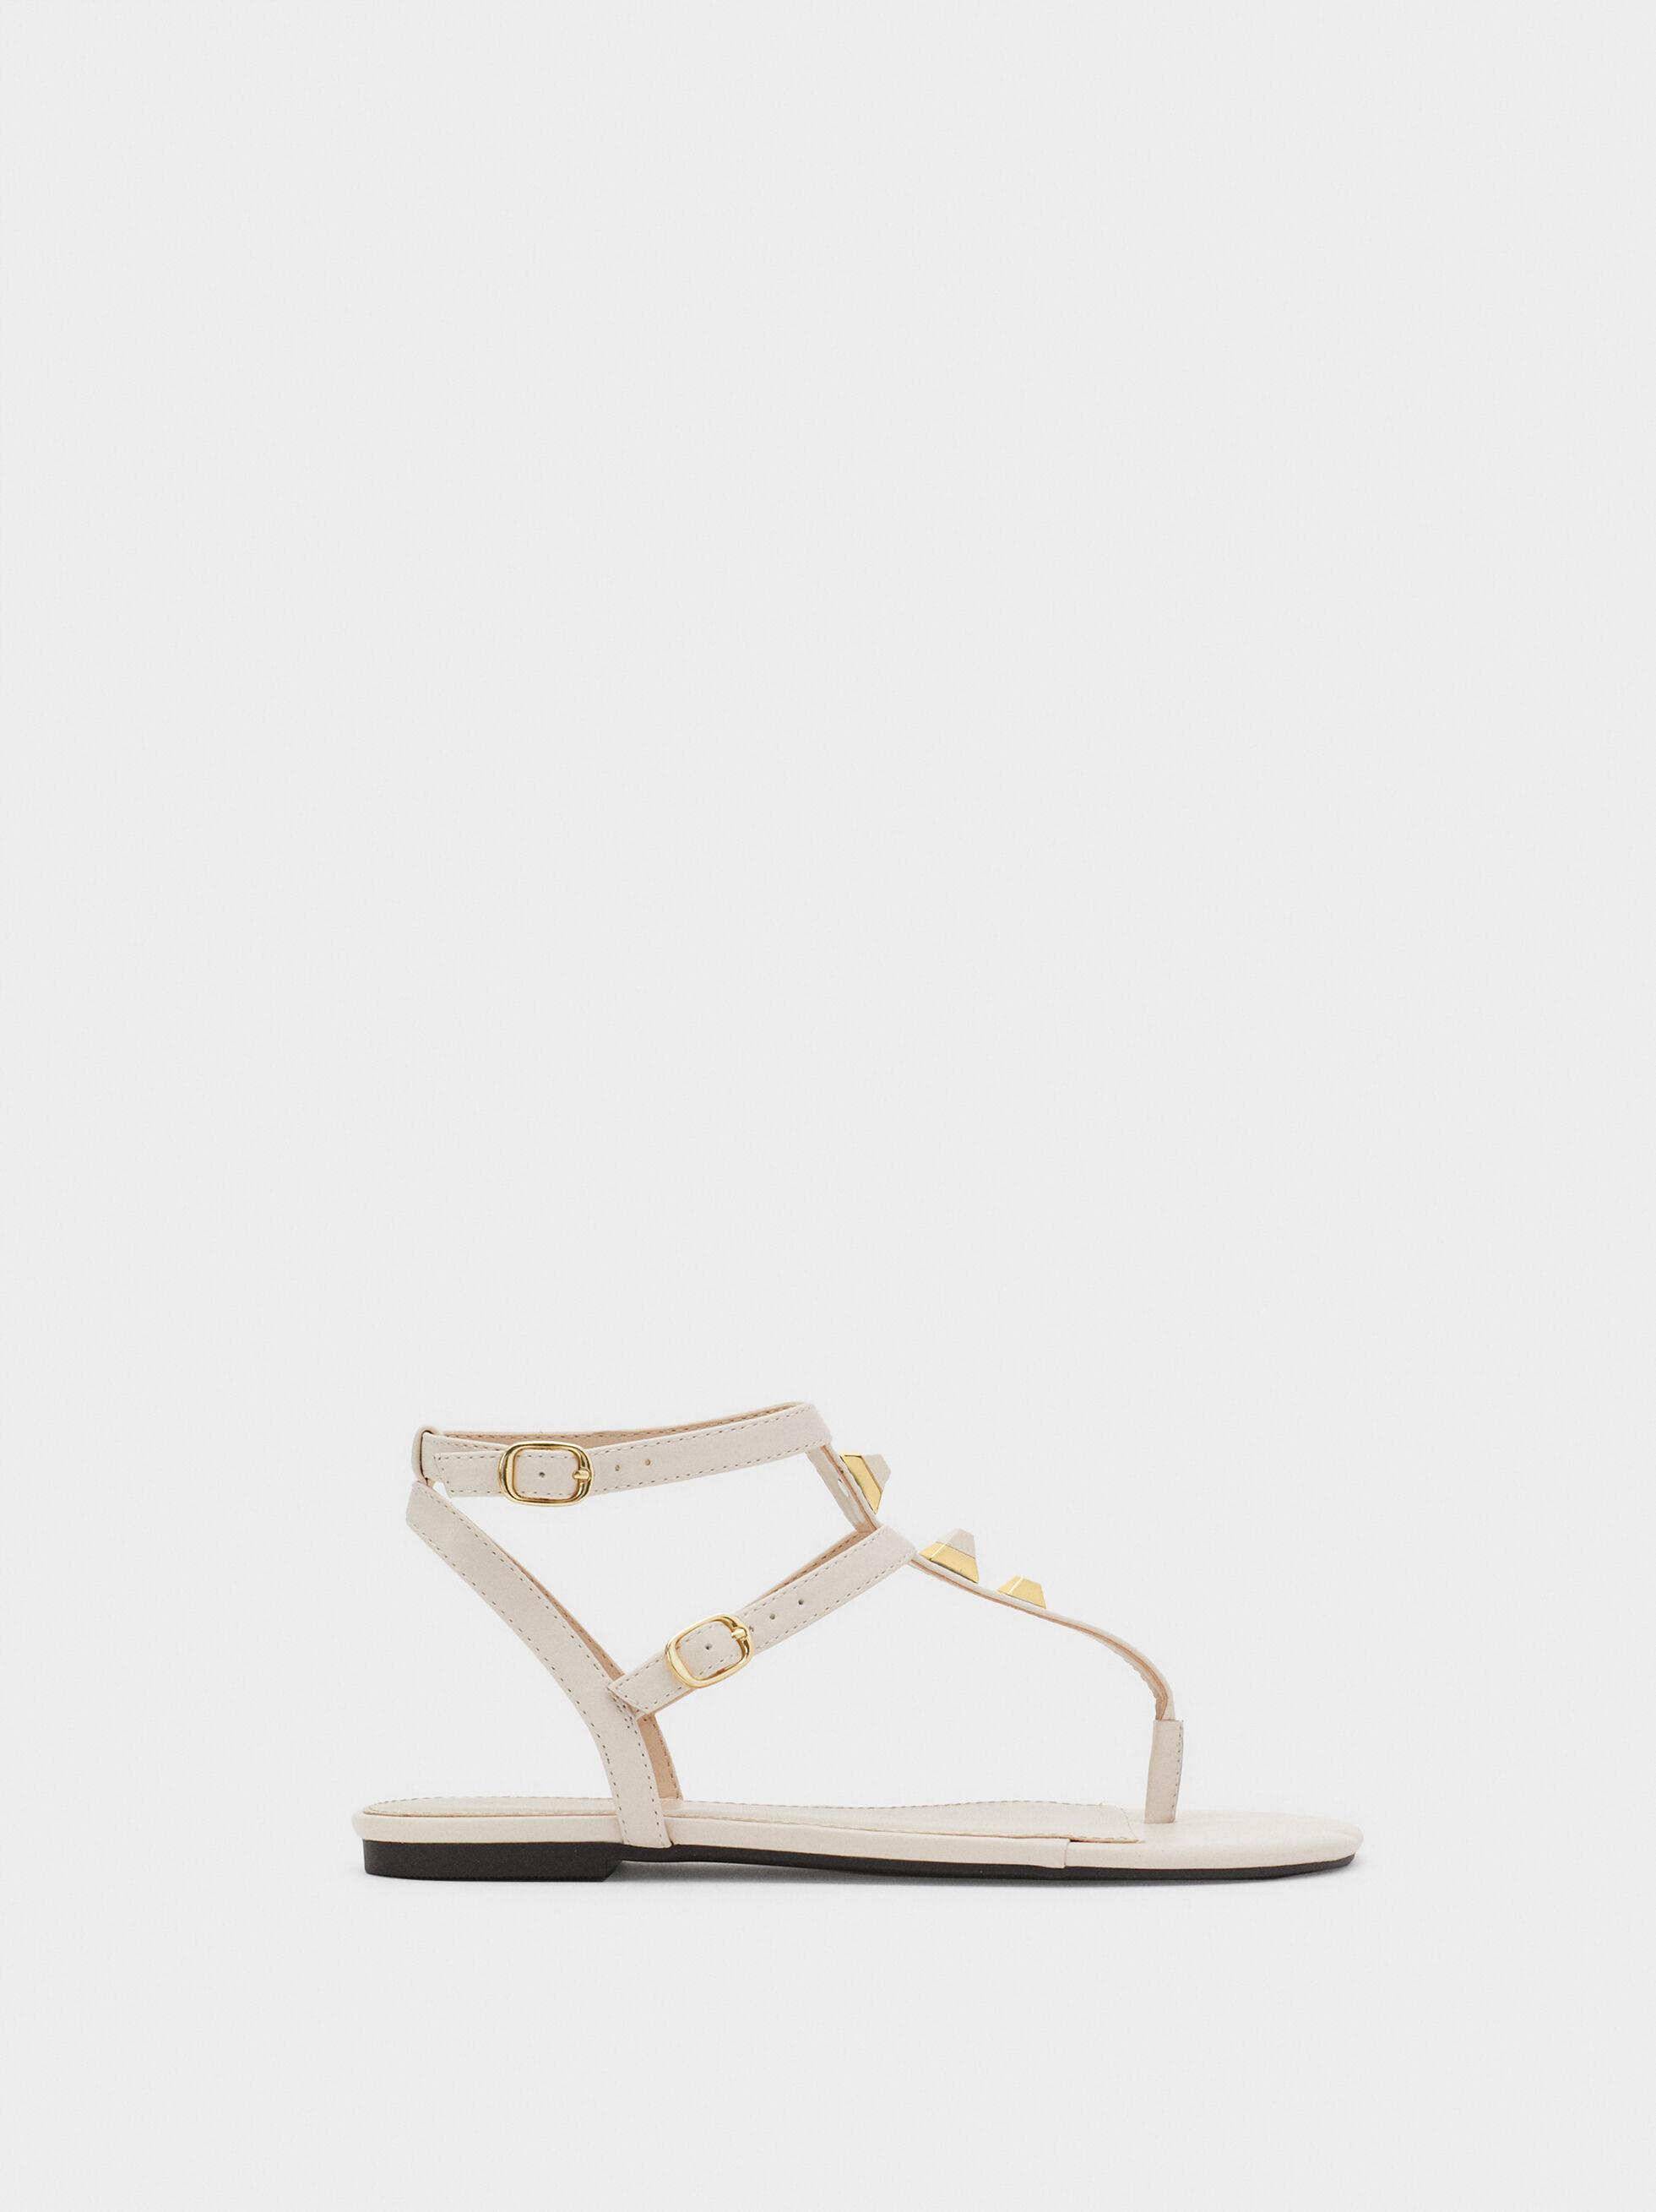 Flat Sandals With Metal Appliqués, White, hi-res